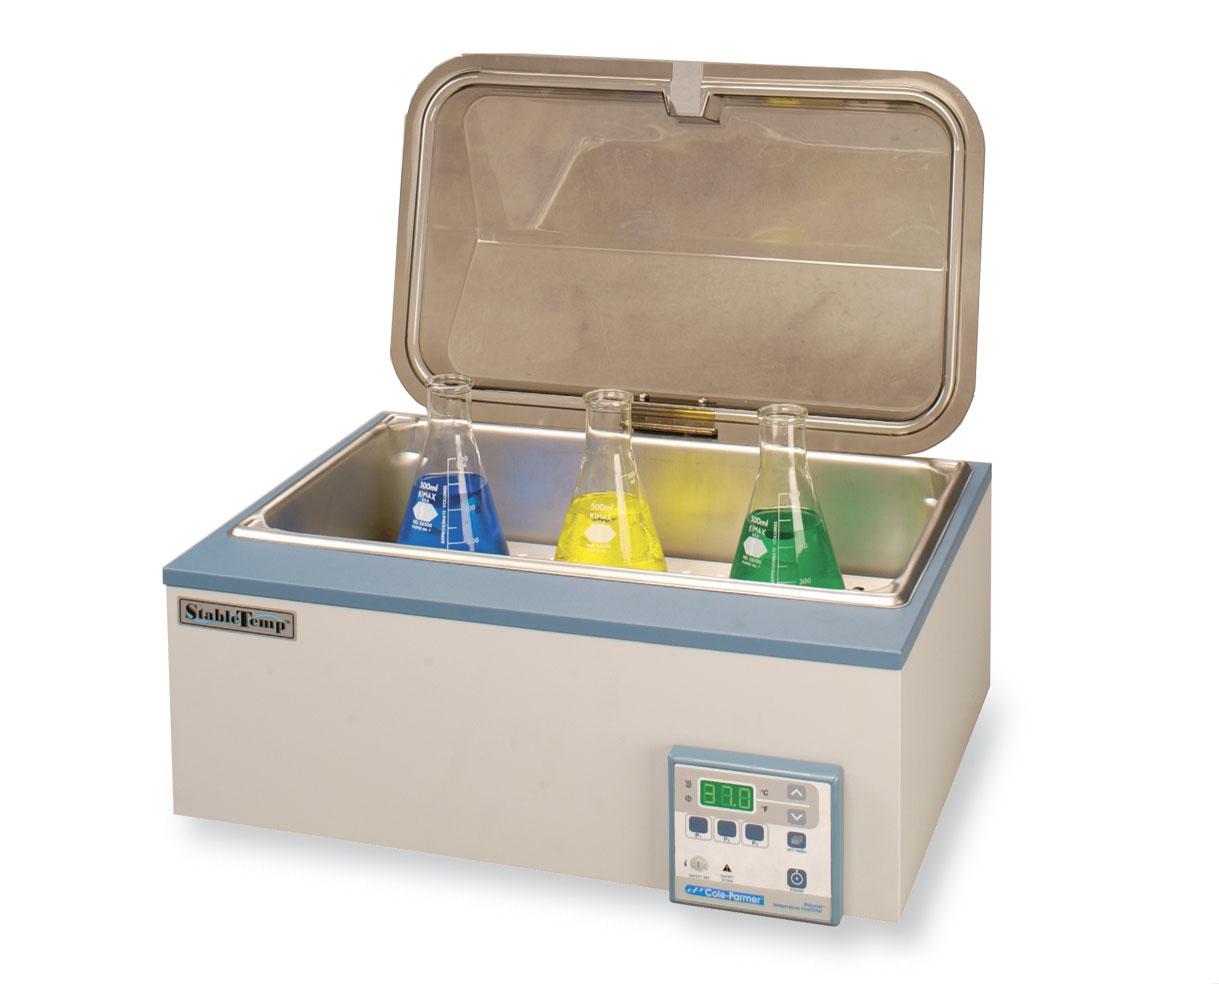 Cole Parmer StableTemp Water bath 5L 120V (Representative photo only) #AC9C1F